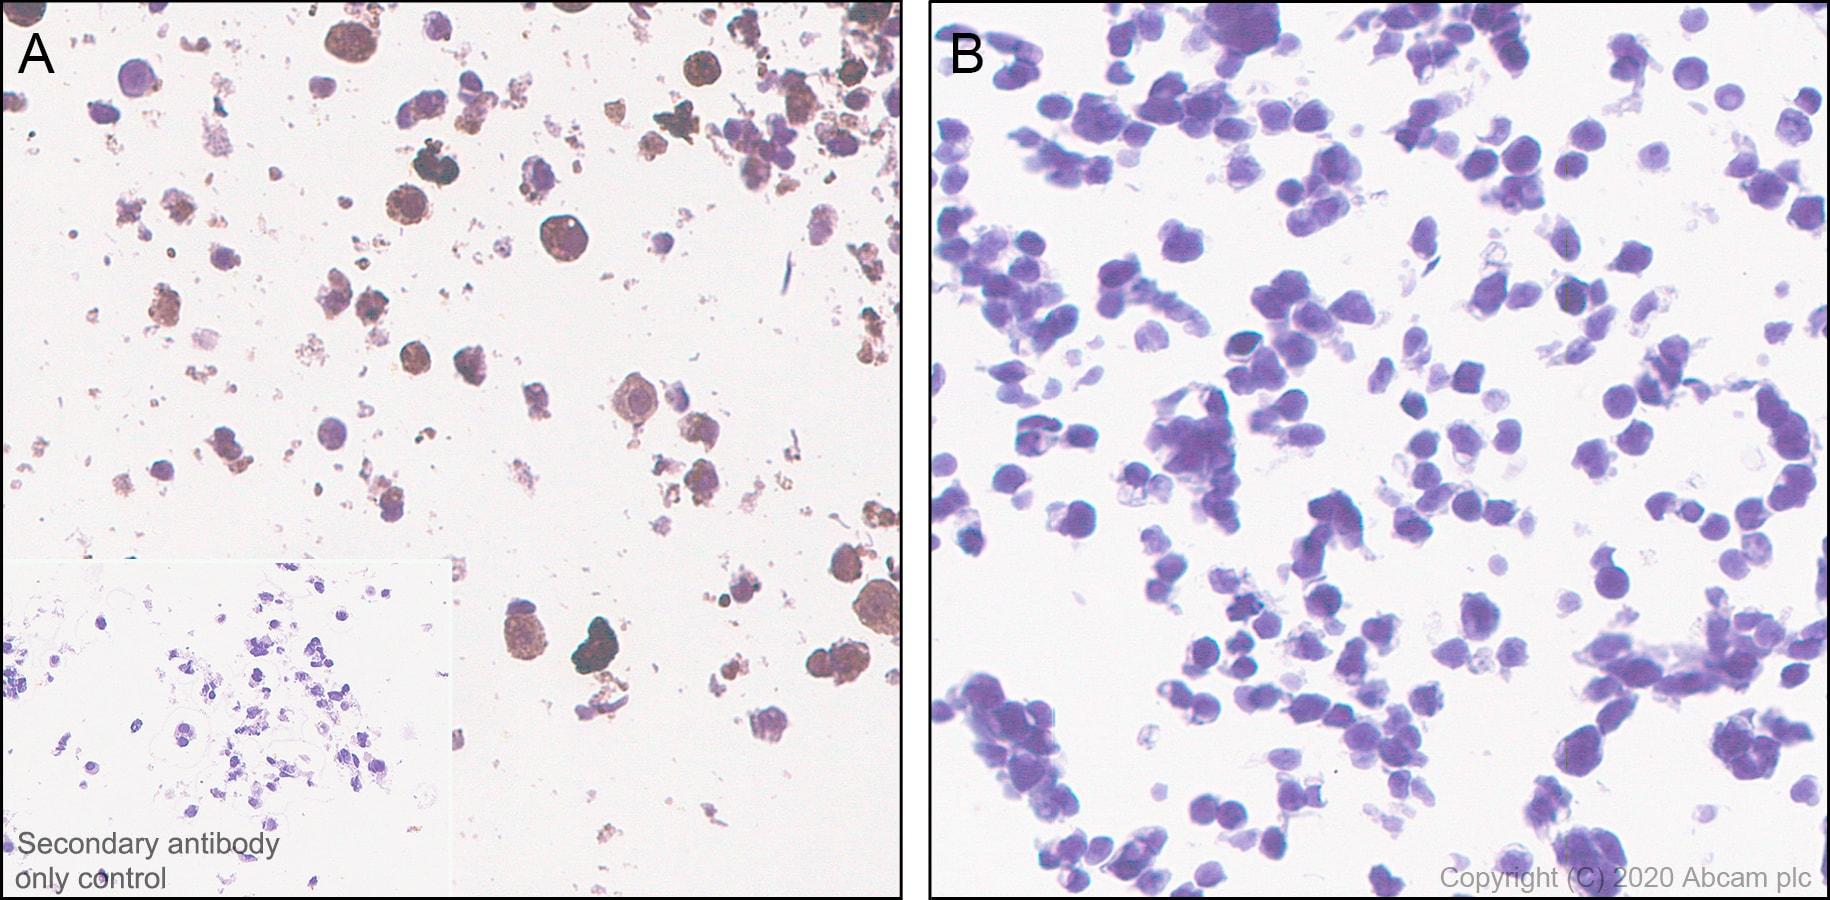 Immunohistochemistry (Formalin/PFA-fixed paraffin-embedded sections) - Anti-CRISPR-Cas9 antibody [KANI345B] - BSA and Azide free (ab271303)